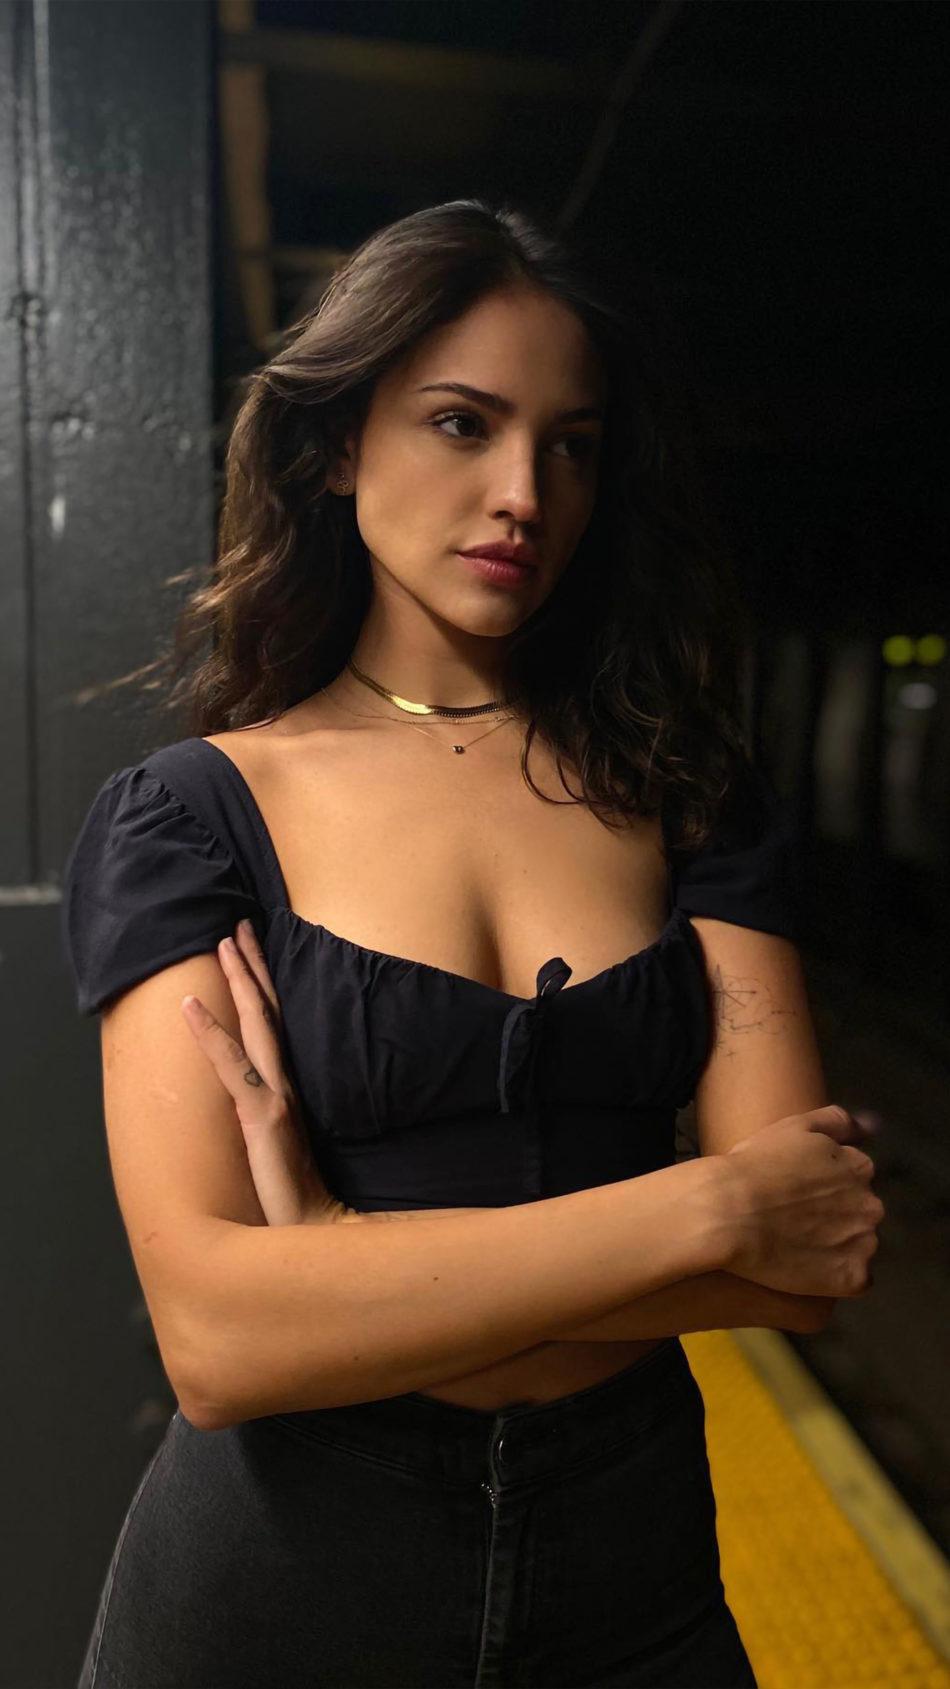 Actress Eiza Gonzalez 2020 4K Ultra HD Mobile Wallpaper